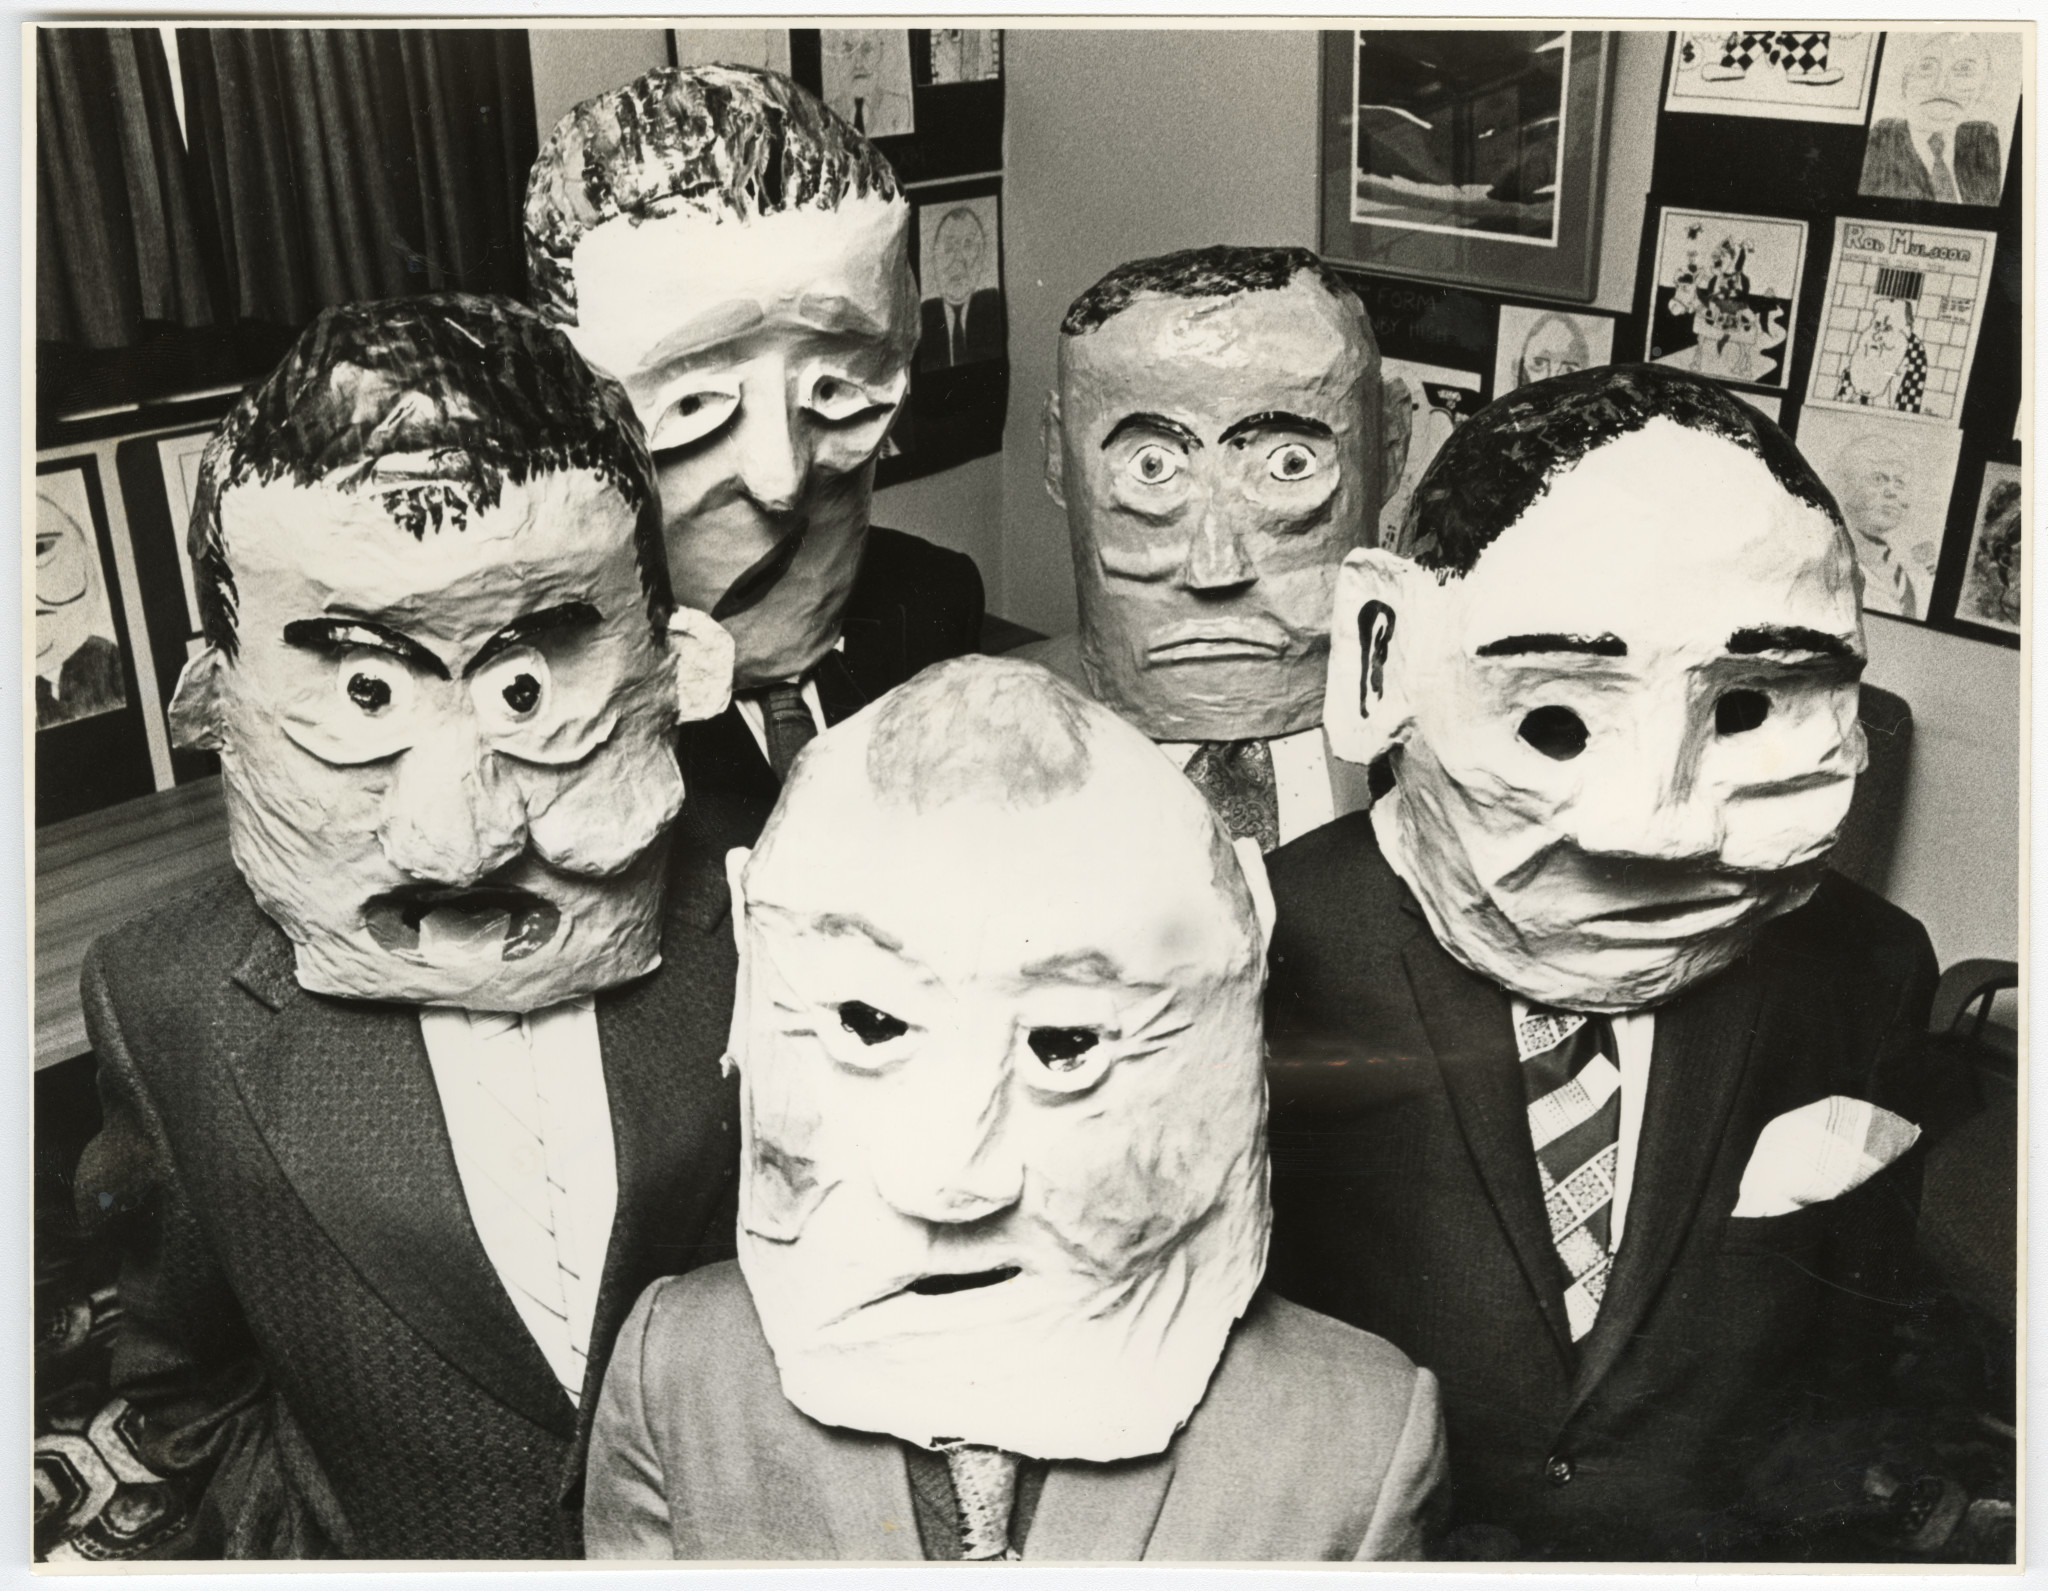 Papier mache masks